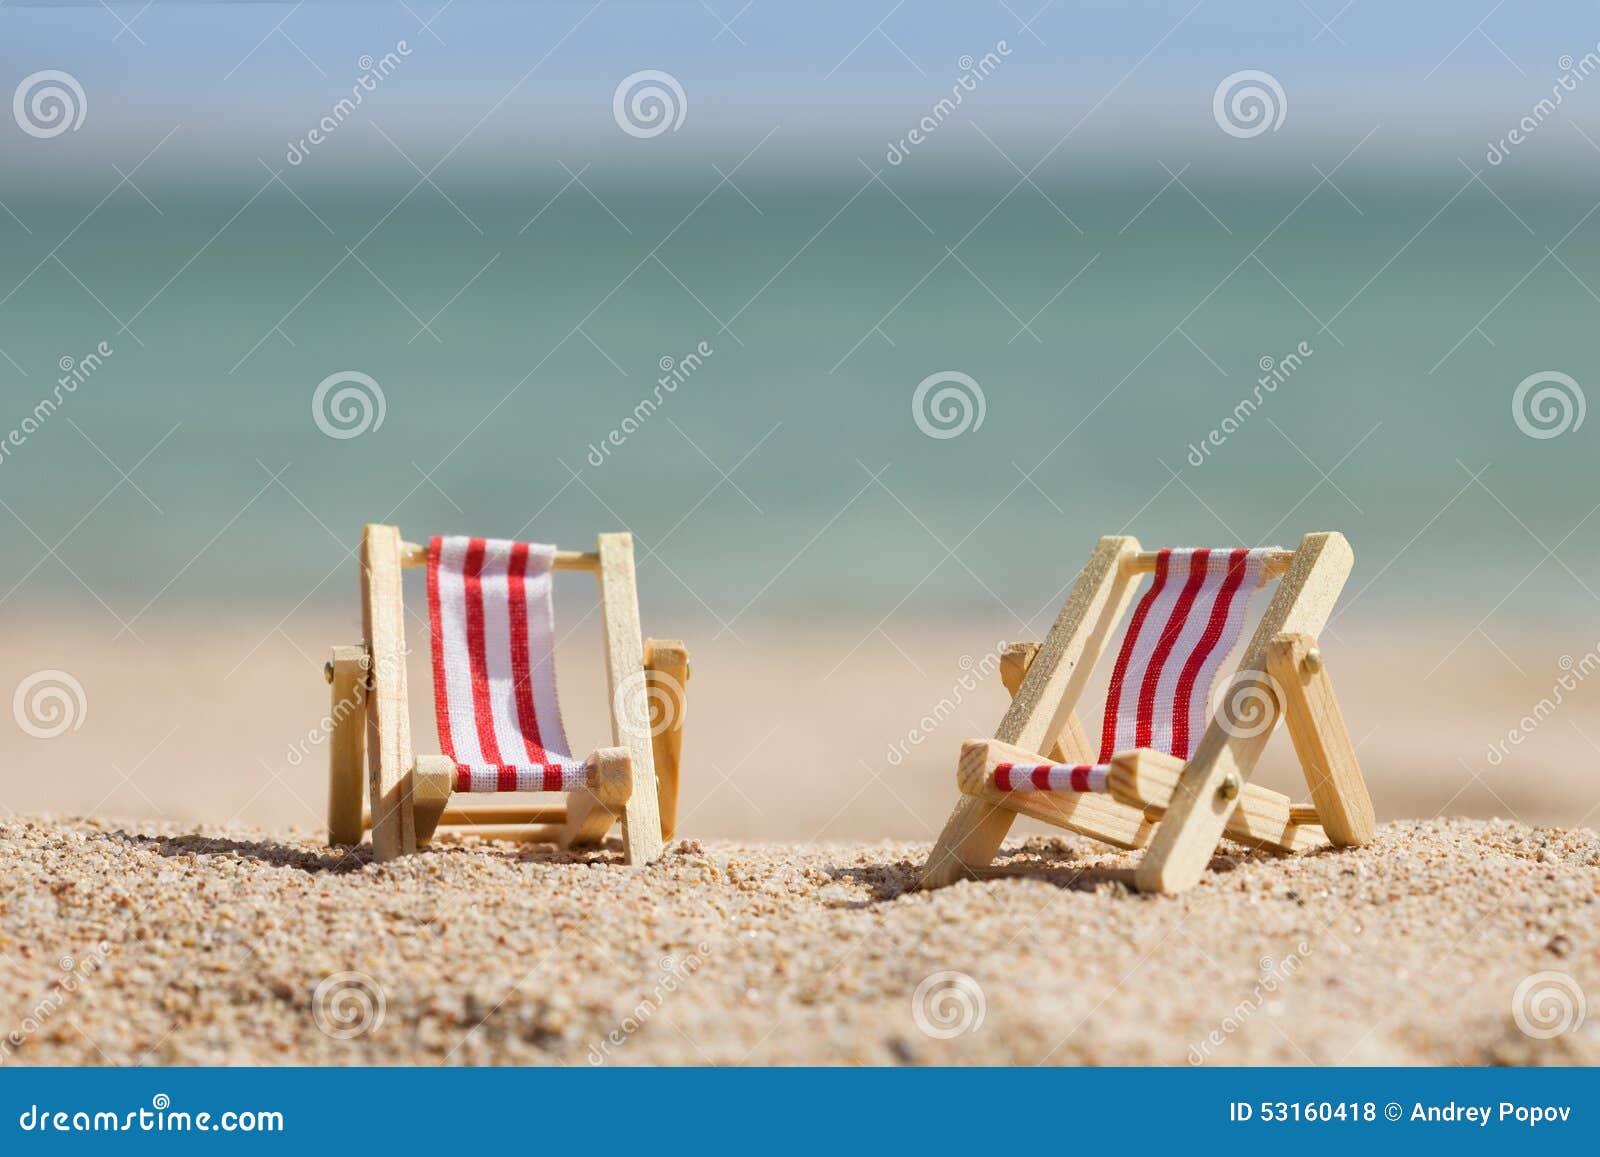 Sedie A Sdraio In Miniatura.Due Sedie A Sdraio Miniatura Fotografia Stock Immagine Di Mare